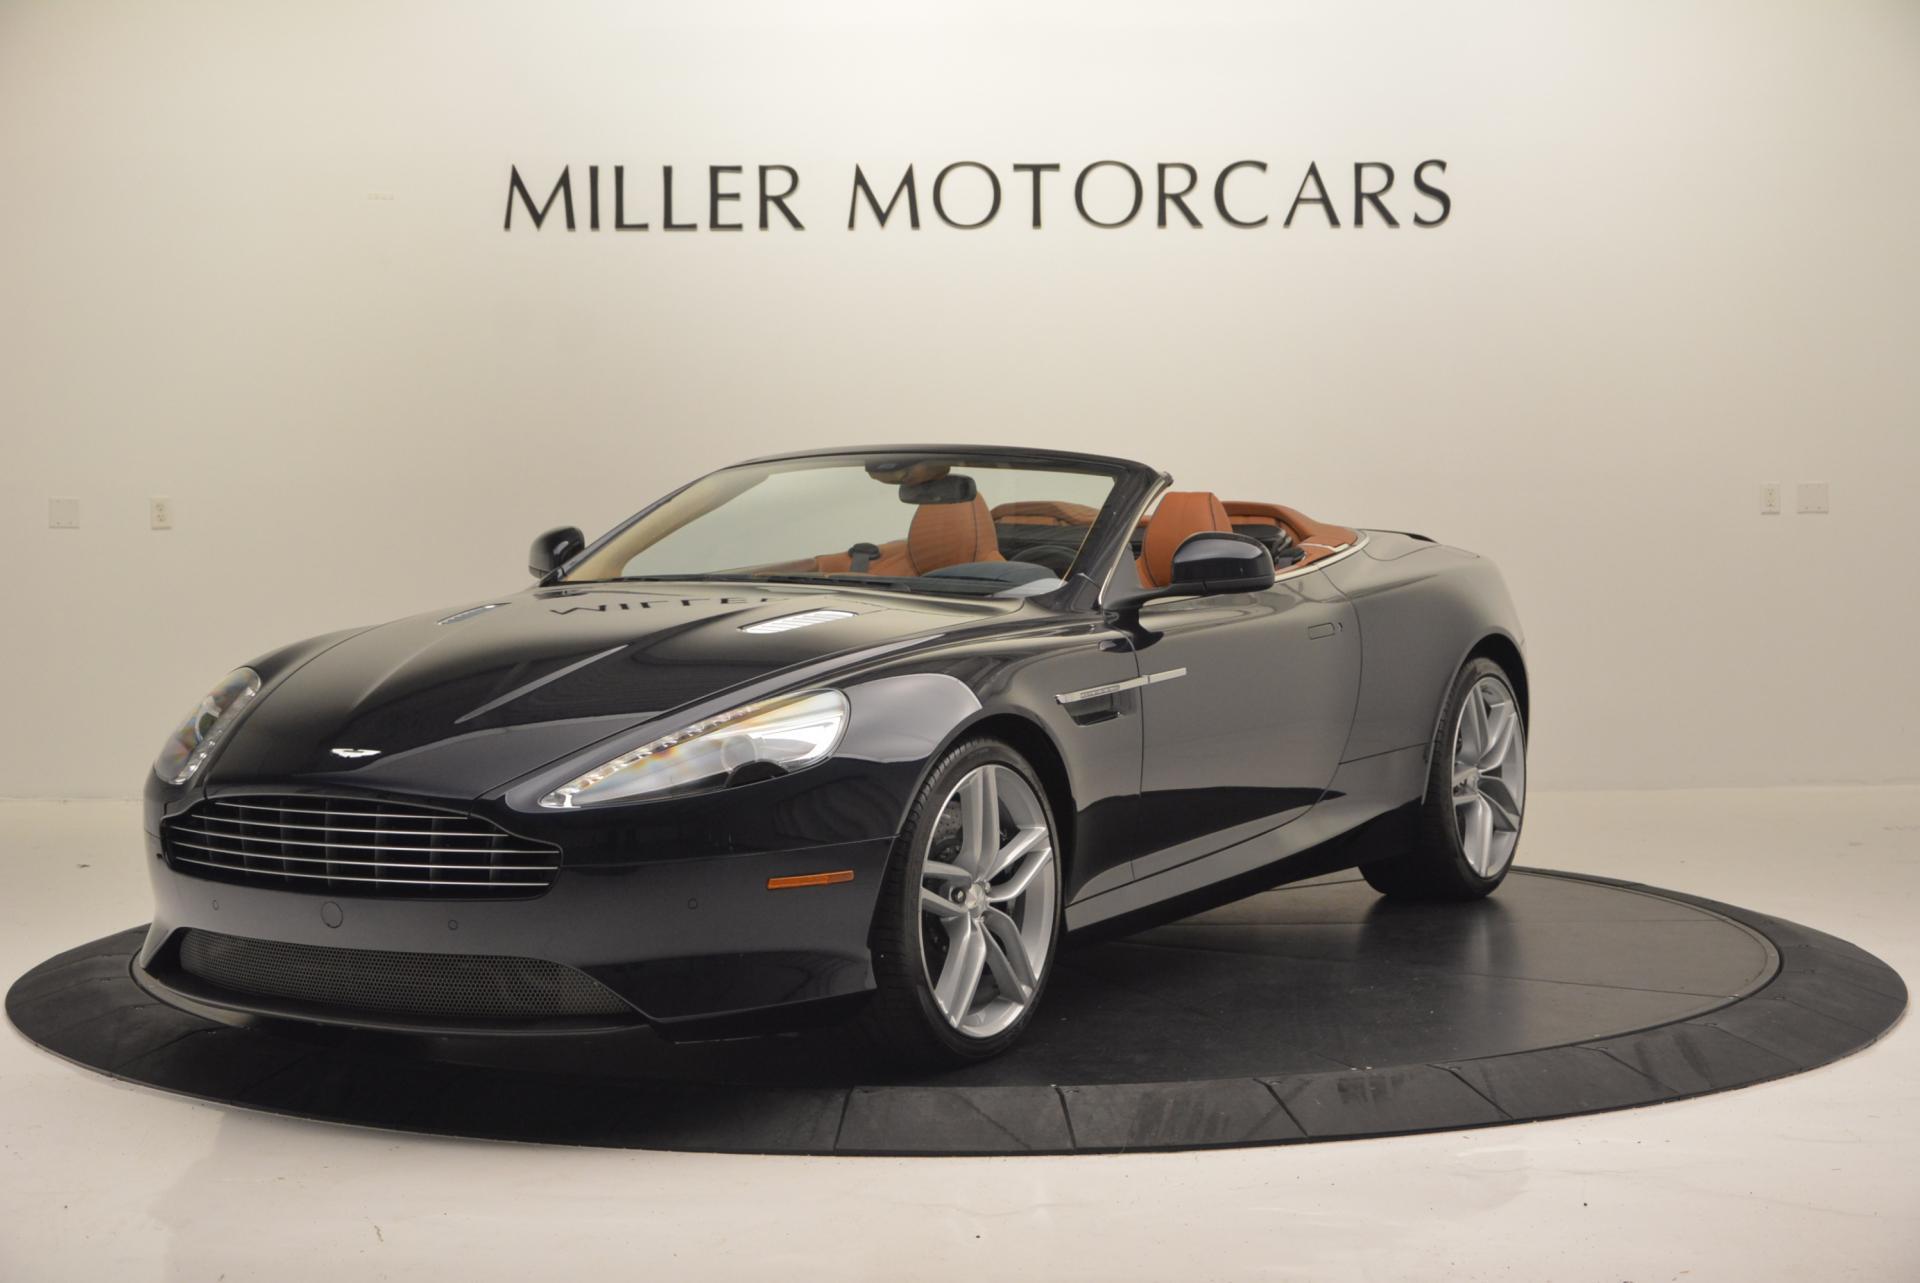 Aston martin db9 usa price